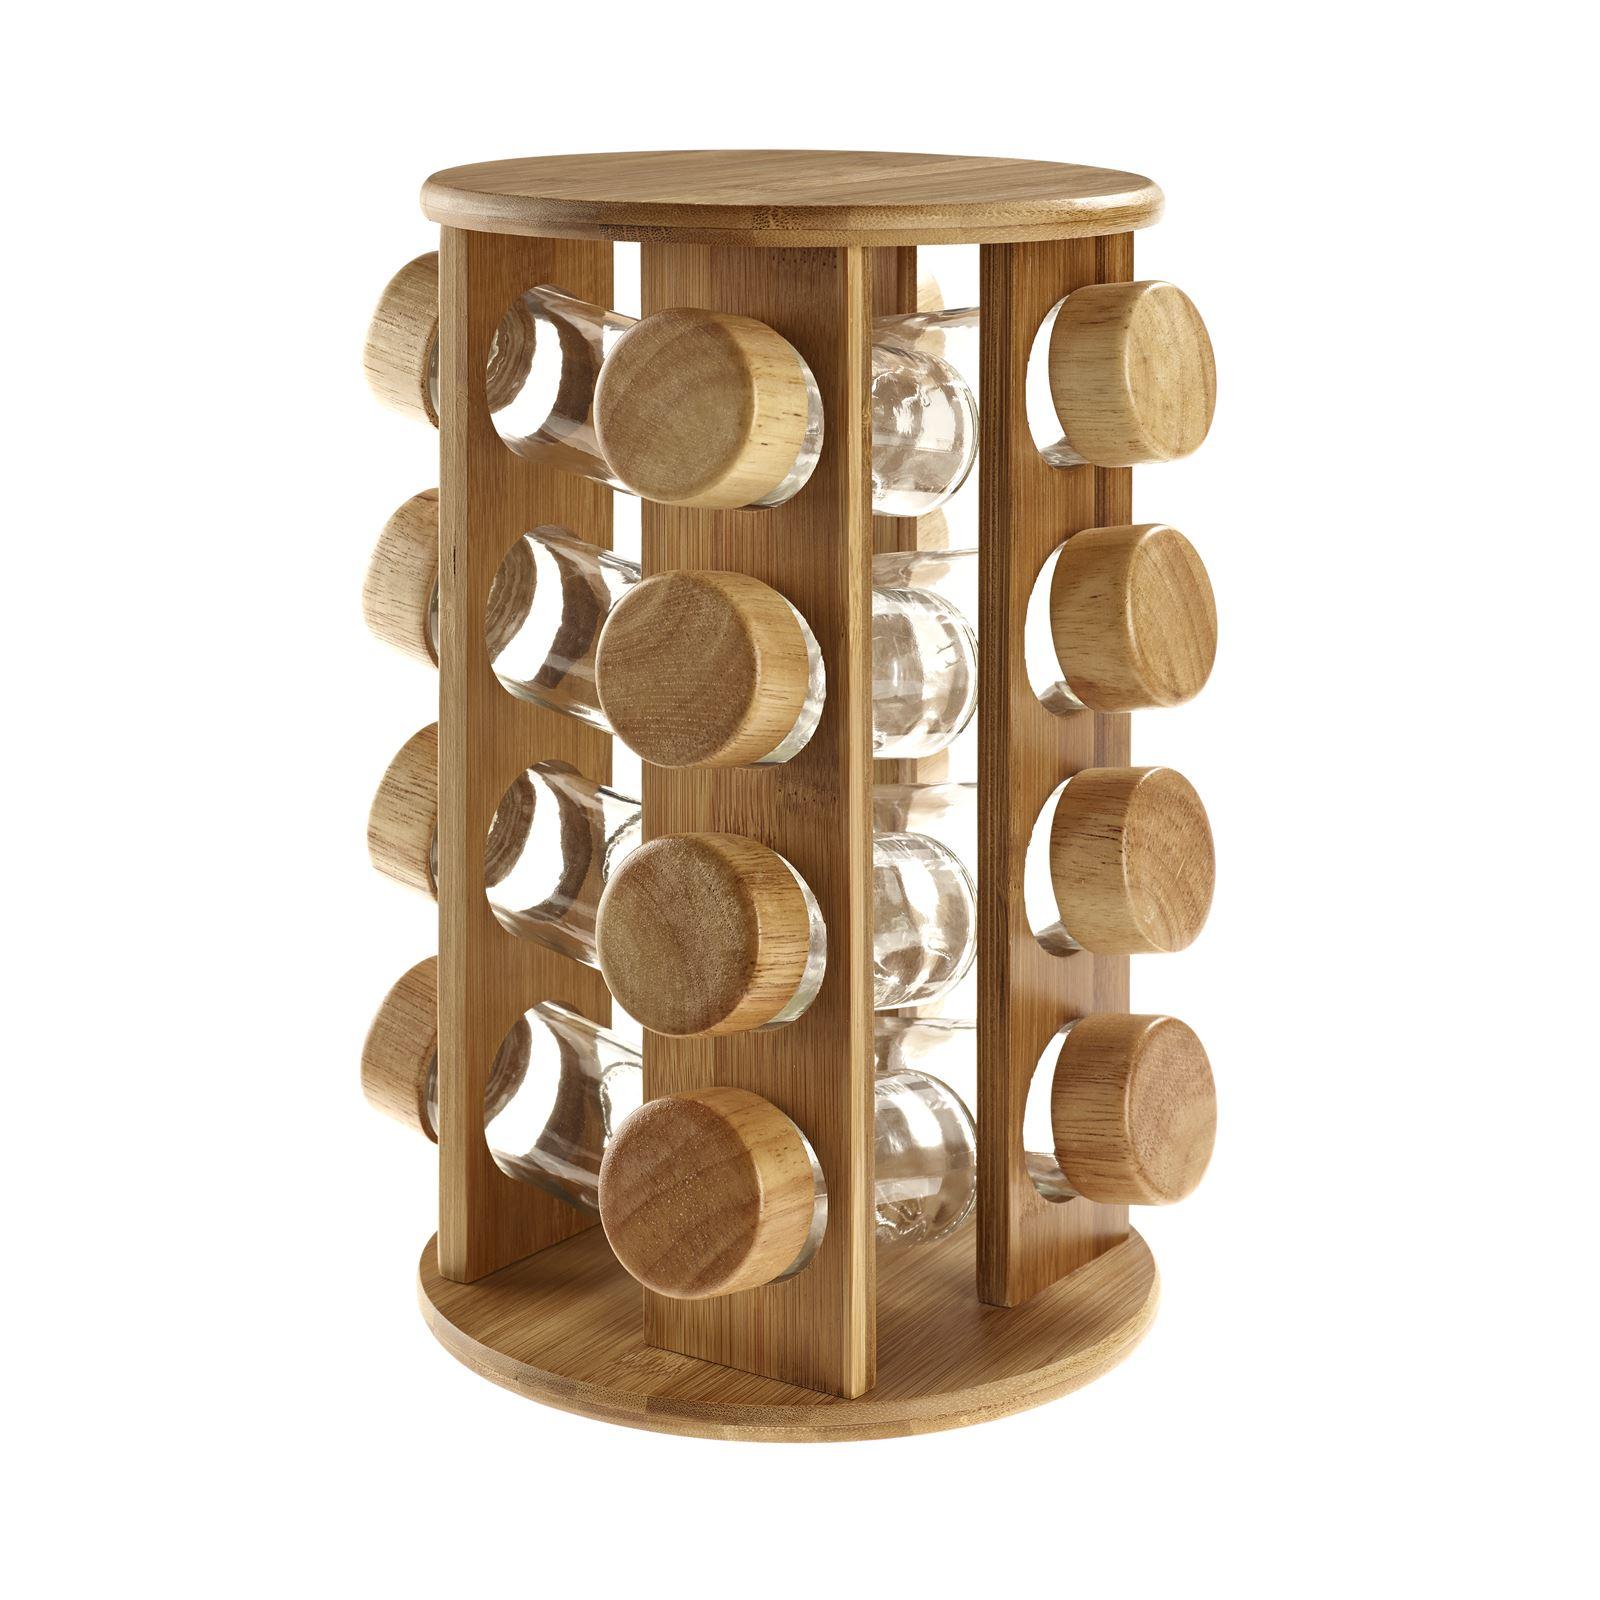 revolving spice racks for kitchen rolling island wooden rotating bamboo rack glass jars